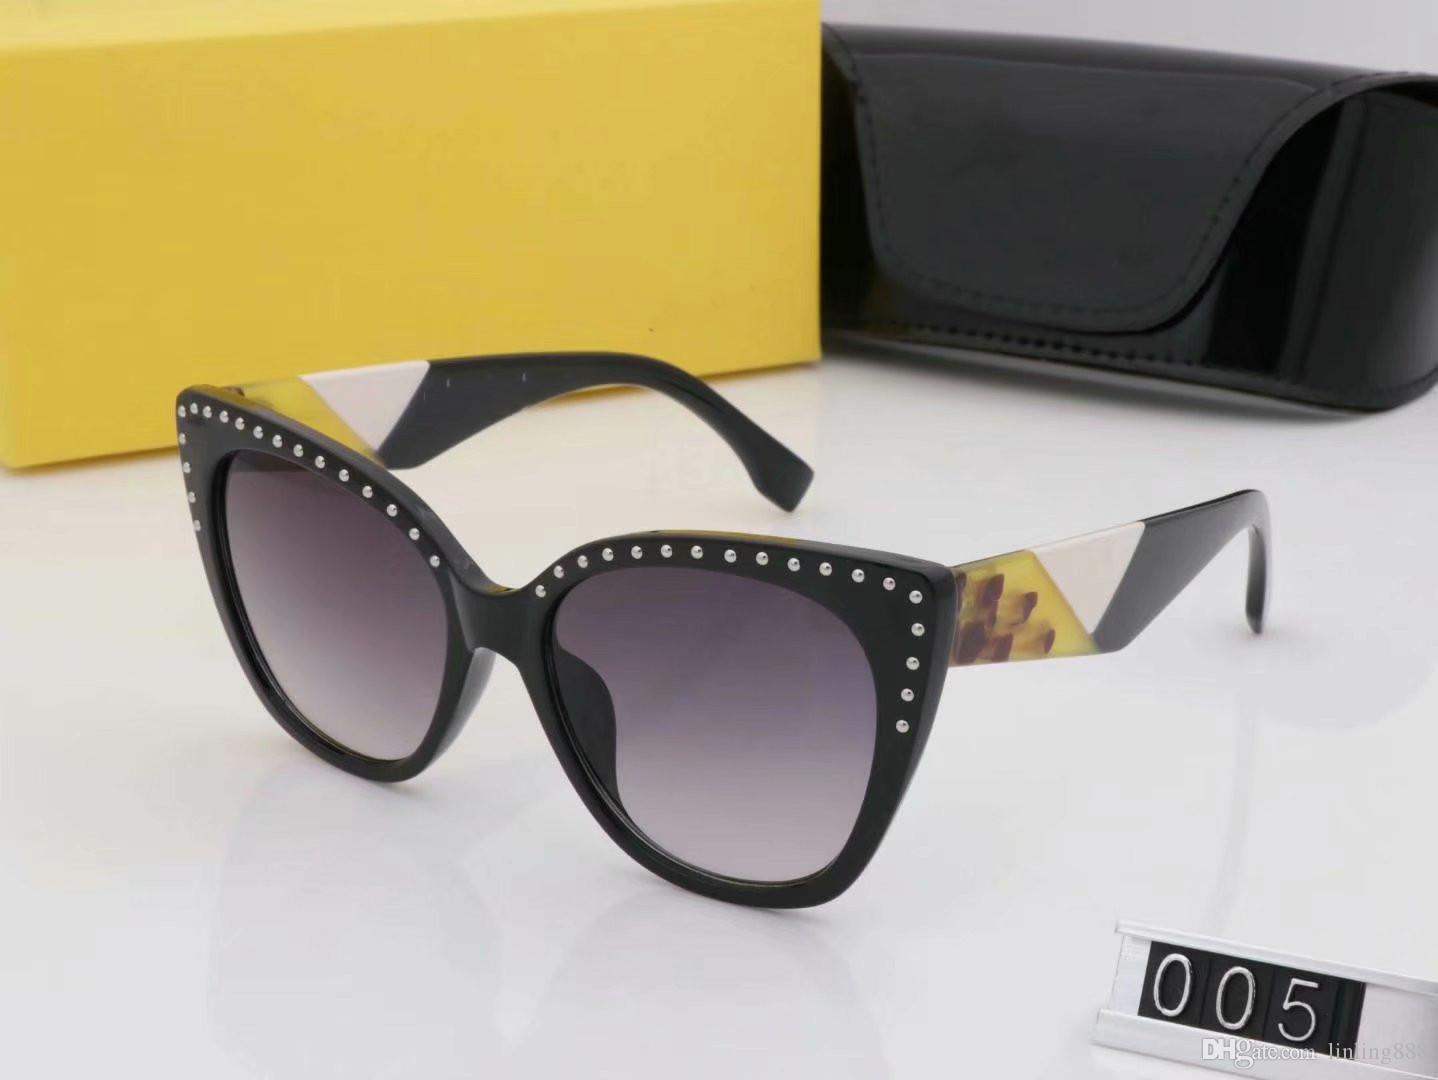 d021e0bf0c4 2019 New Fashion Mens Womens Cat Eye Sunglasses Ladies Frame Sun Glasses  Bold Style Sun Glasses Luxury Women Cat Eye Brand Sunglasses John Lennon  Sunglasses ...